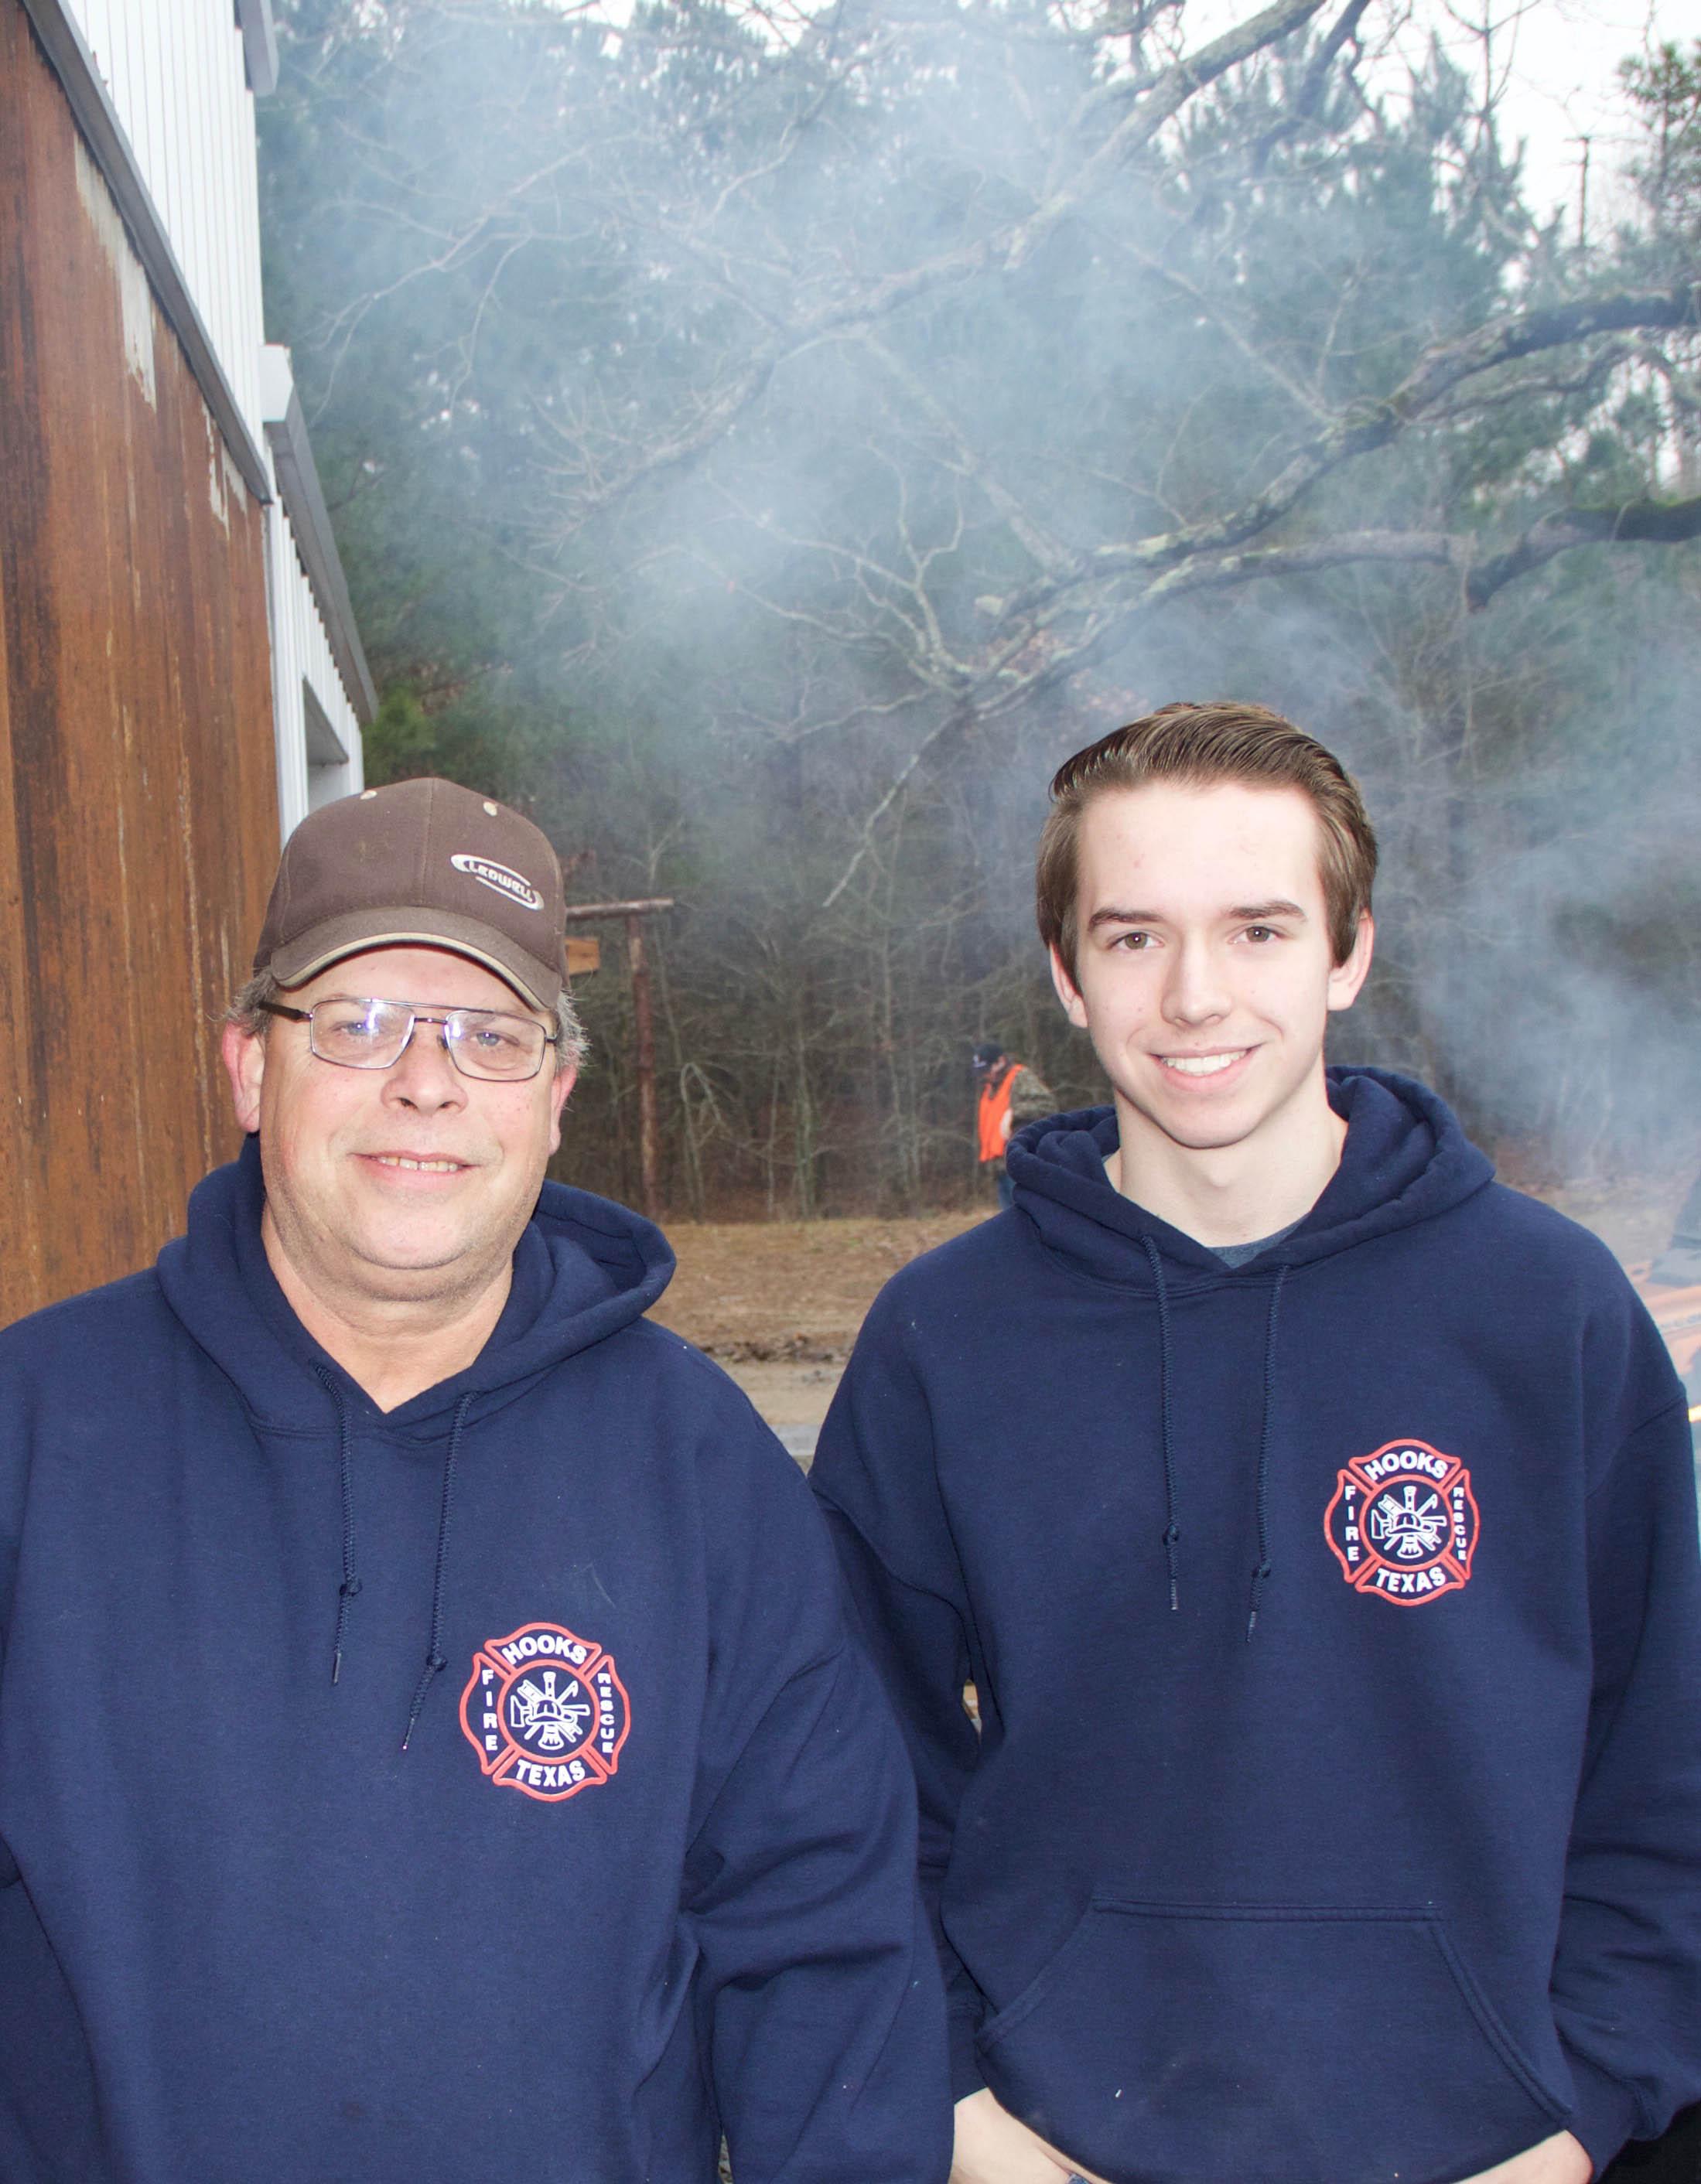 Hooks Volunteer Firemen Jay Farris and Logan Knight